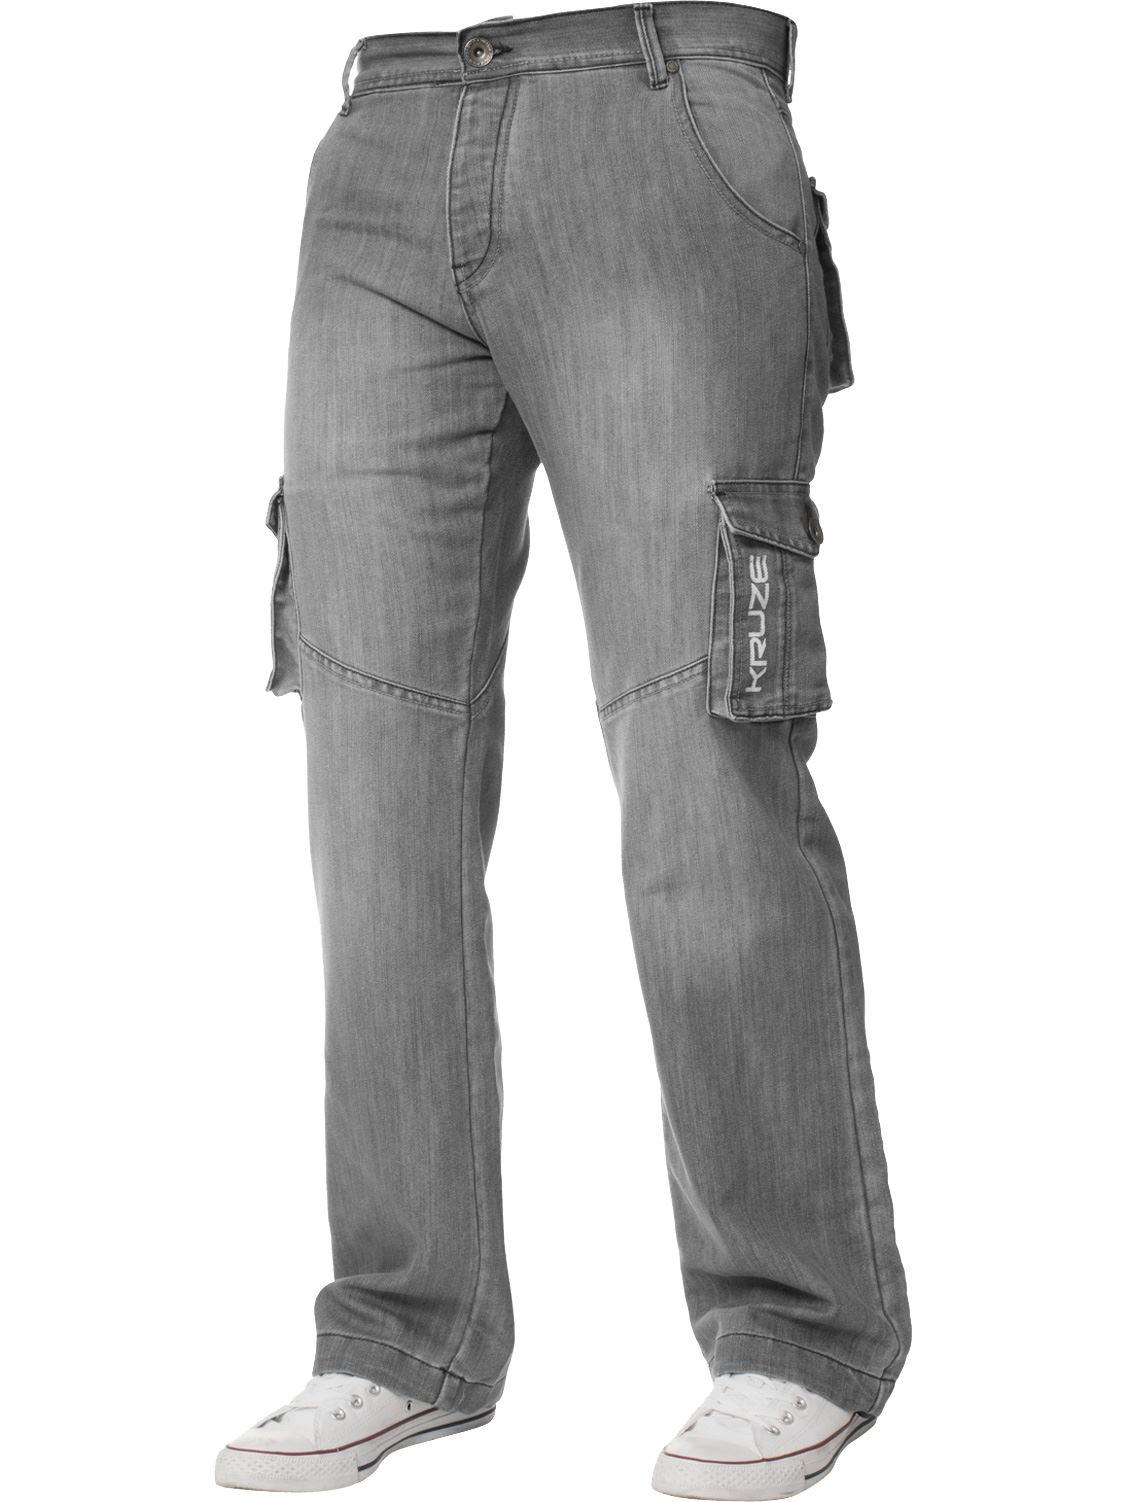 Grandes-jeans-para-hombre-de-combate-de-Kruze-Rey-Alto-Pierna-Cargo-Pantalones-Jeans-Pantalones miniatura 22